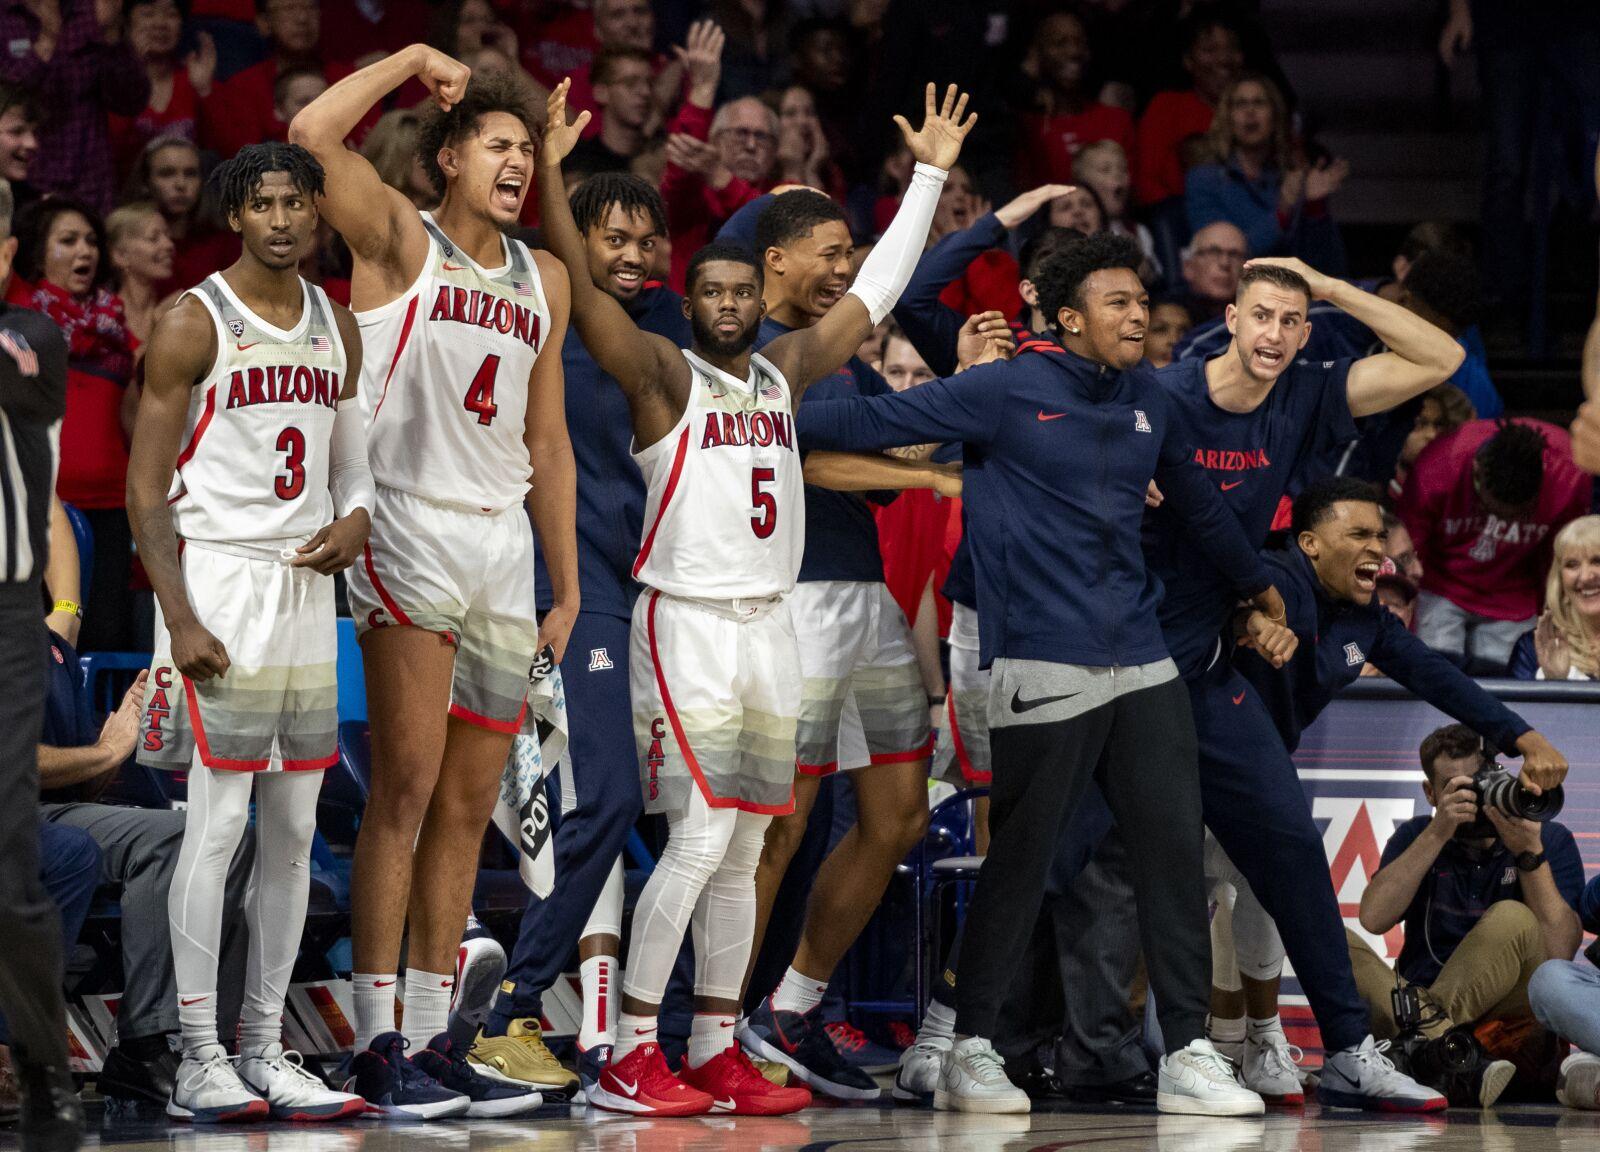 NCAA Basketball: Why computers love Arizona and hate the AP Poll